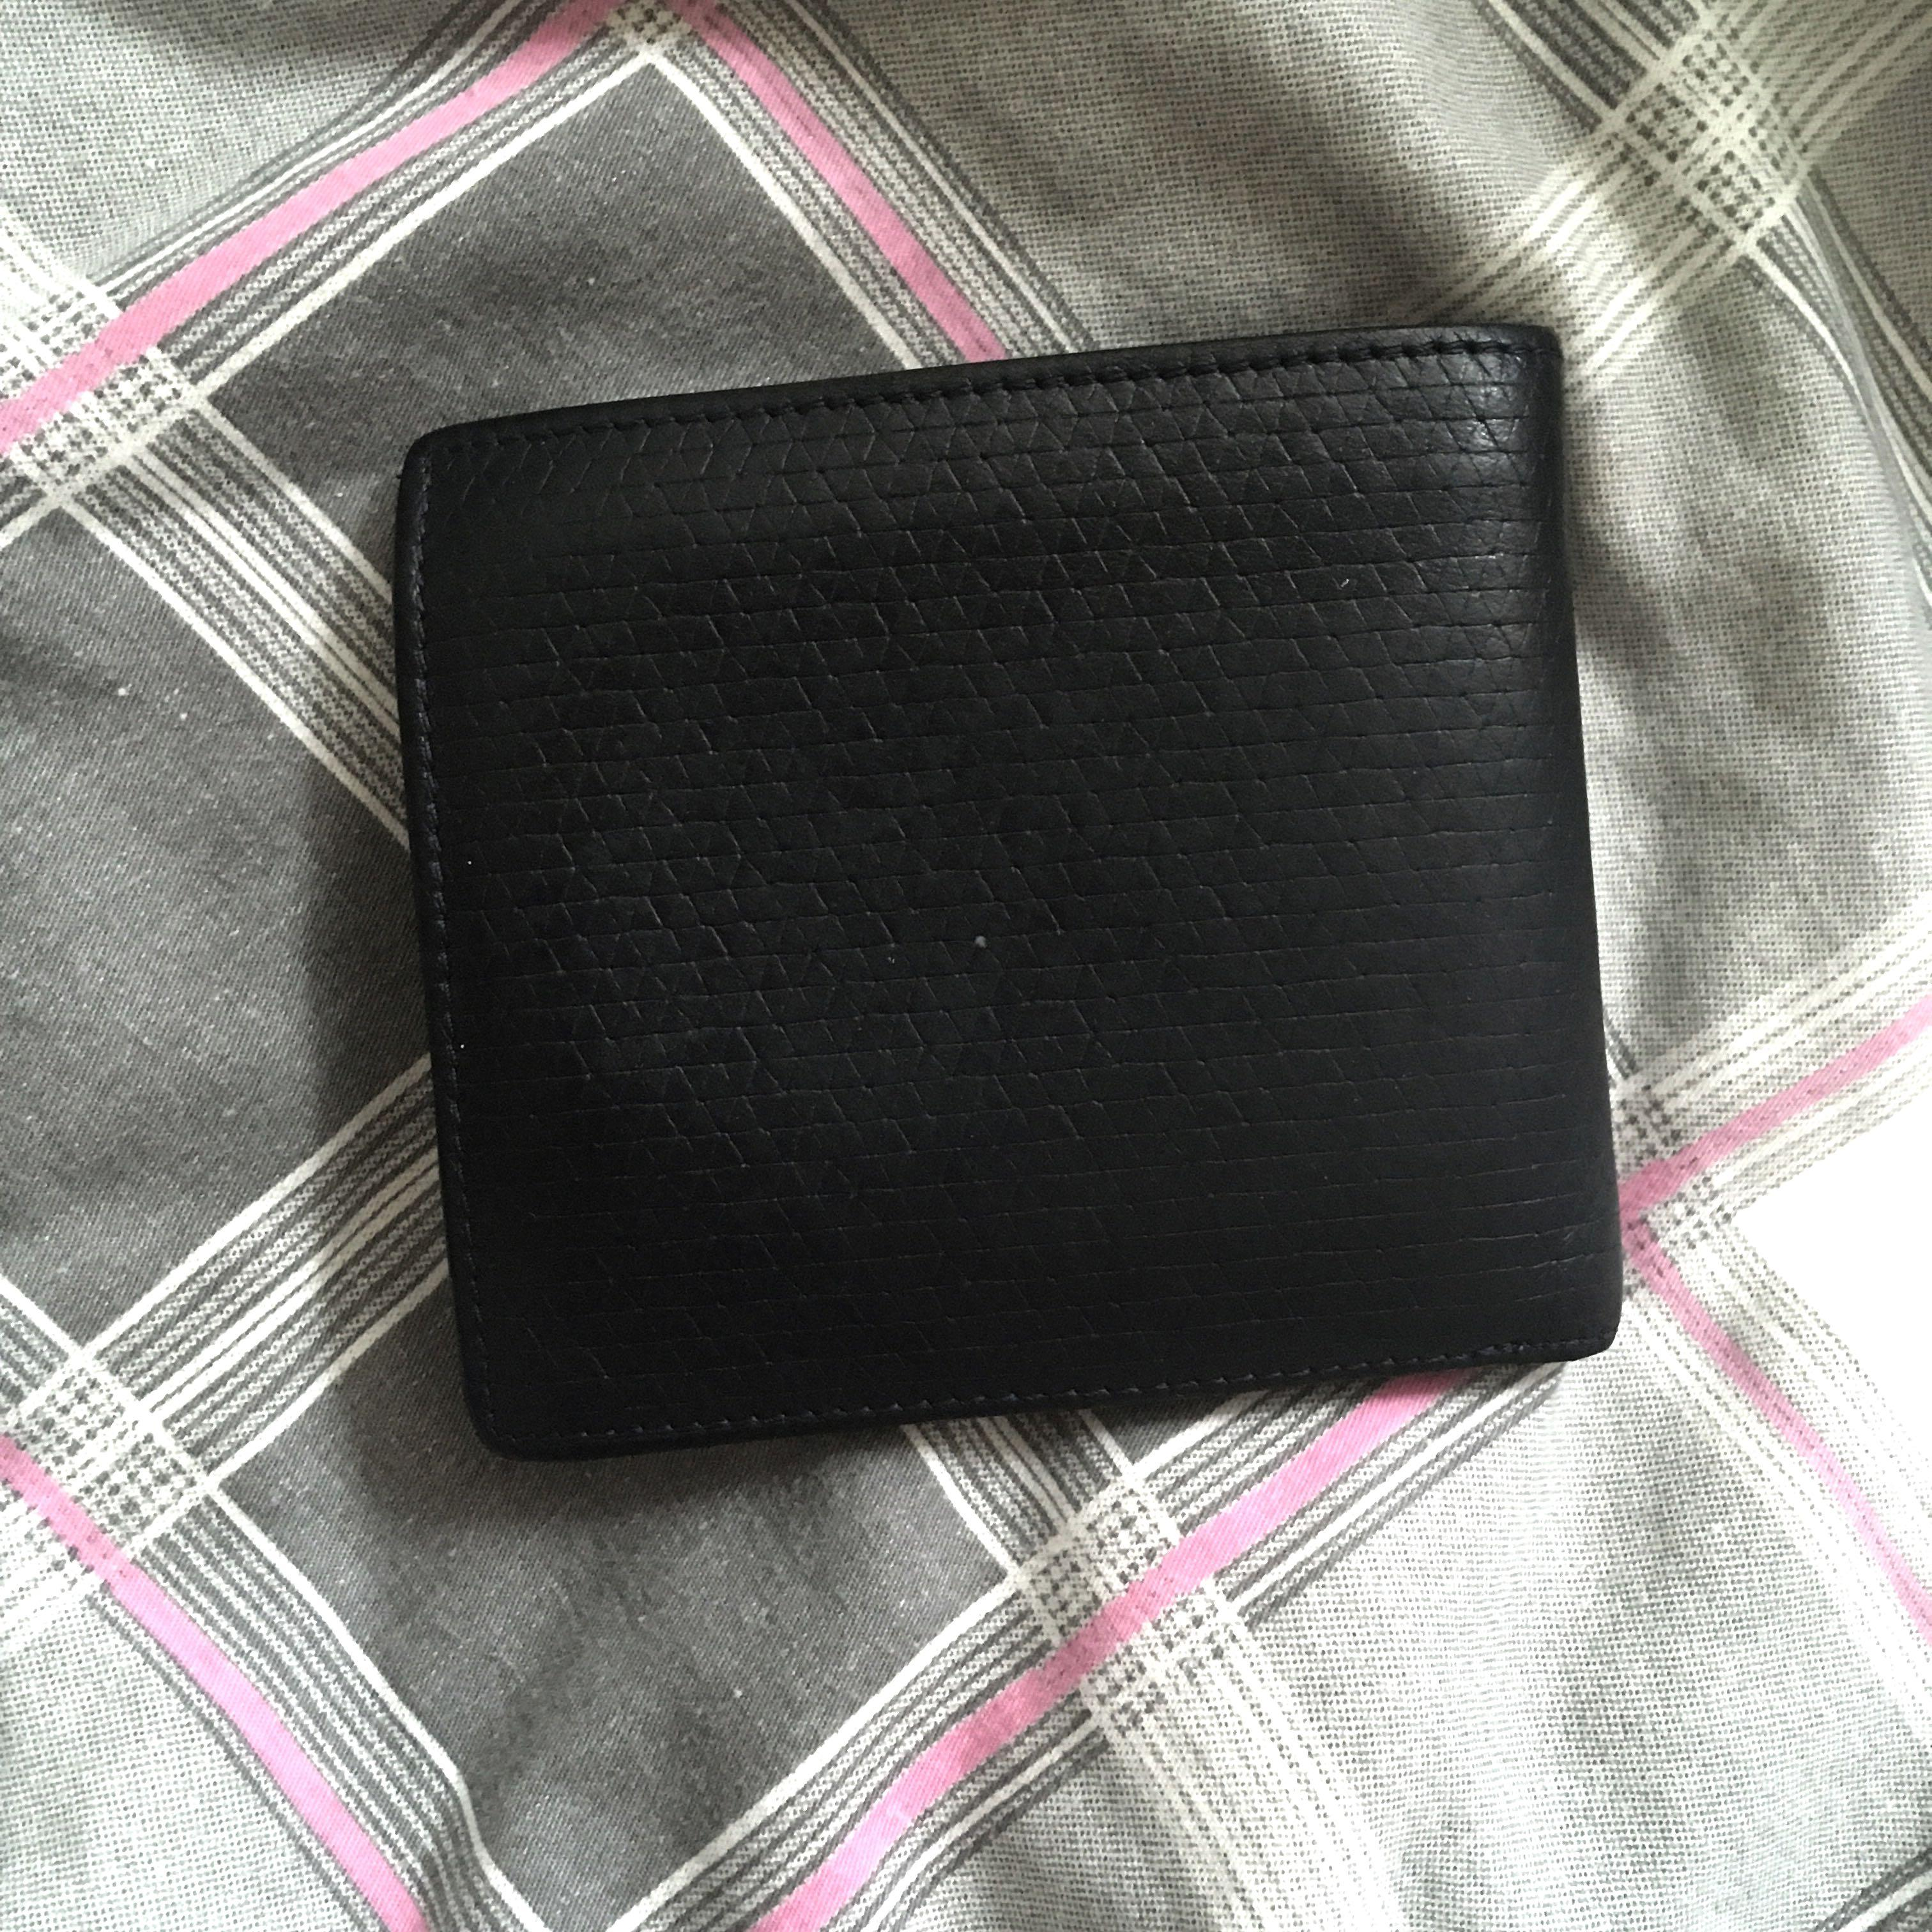 Alexander McQueen fold wallet